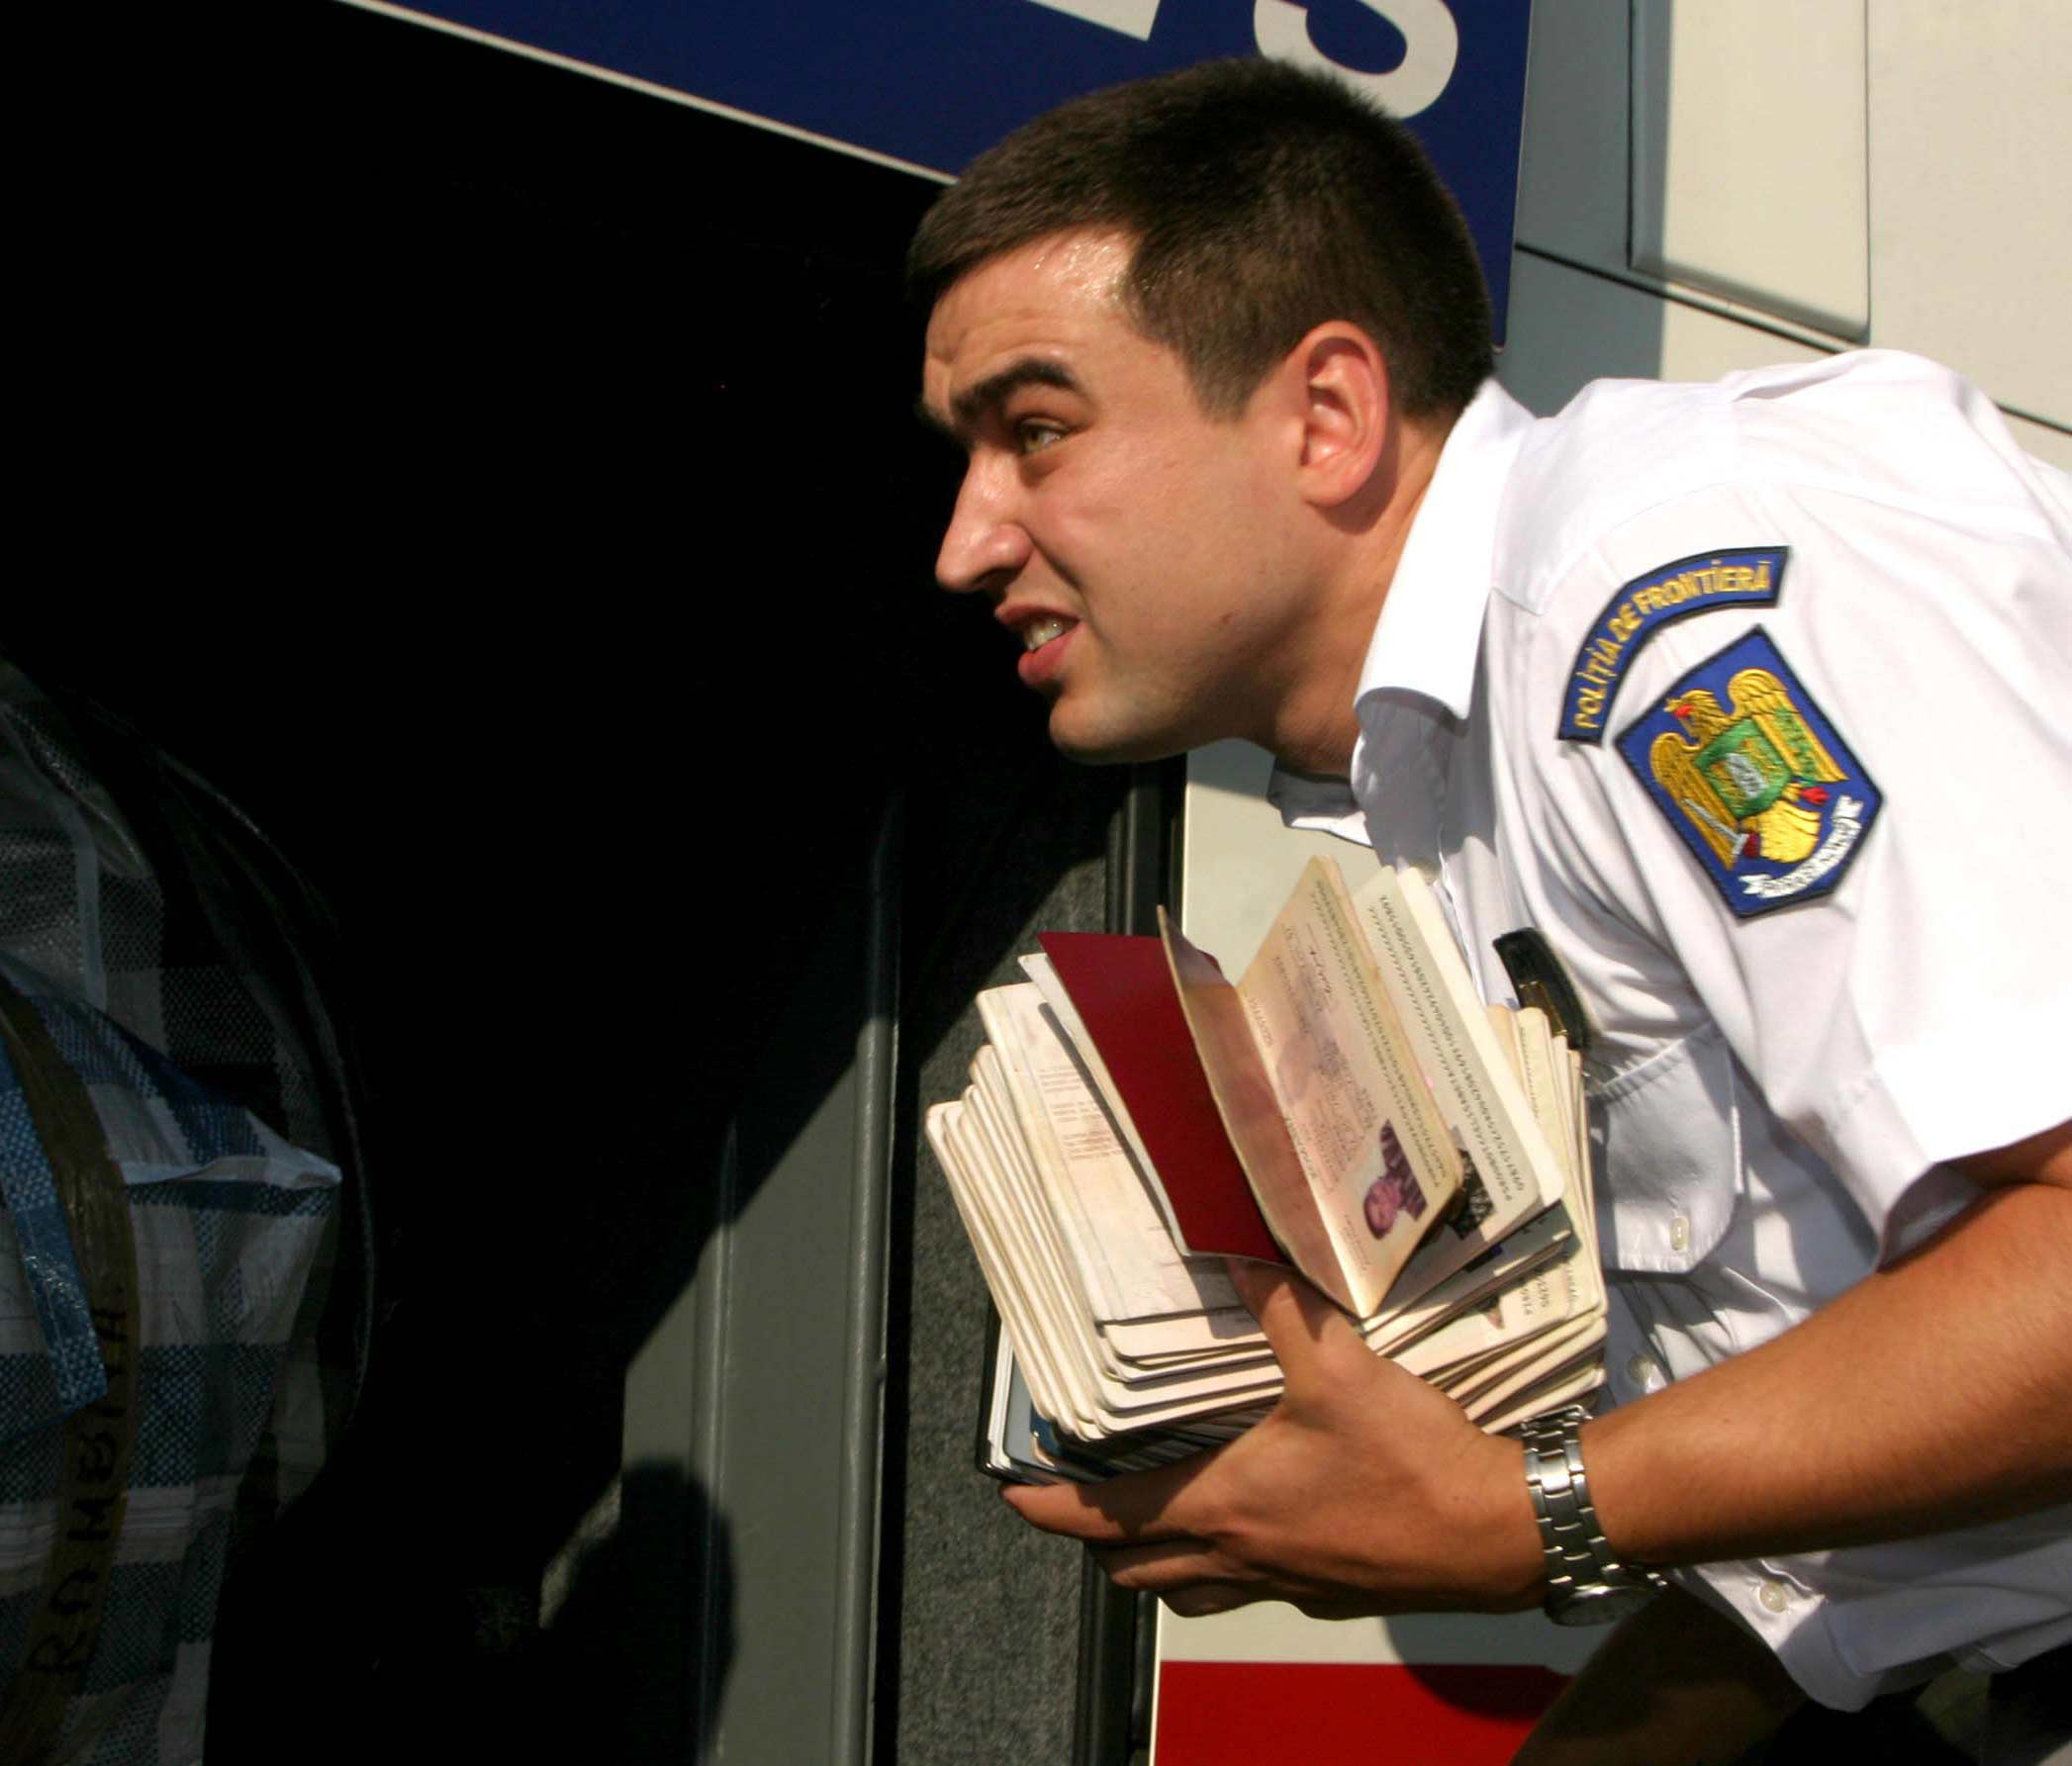 http://storage0.dms.mpinteractiv.ro/media/1/186/3927/2529431/1/vama-control-pasapoarte-rom.jpg